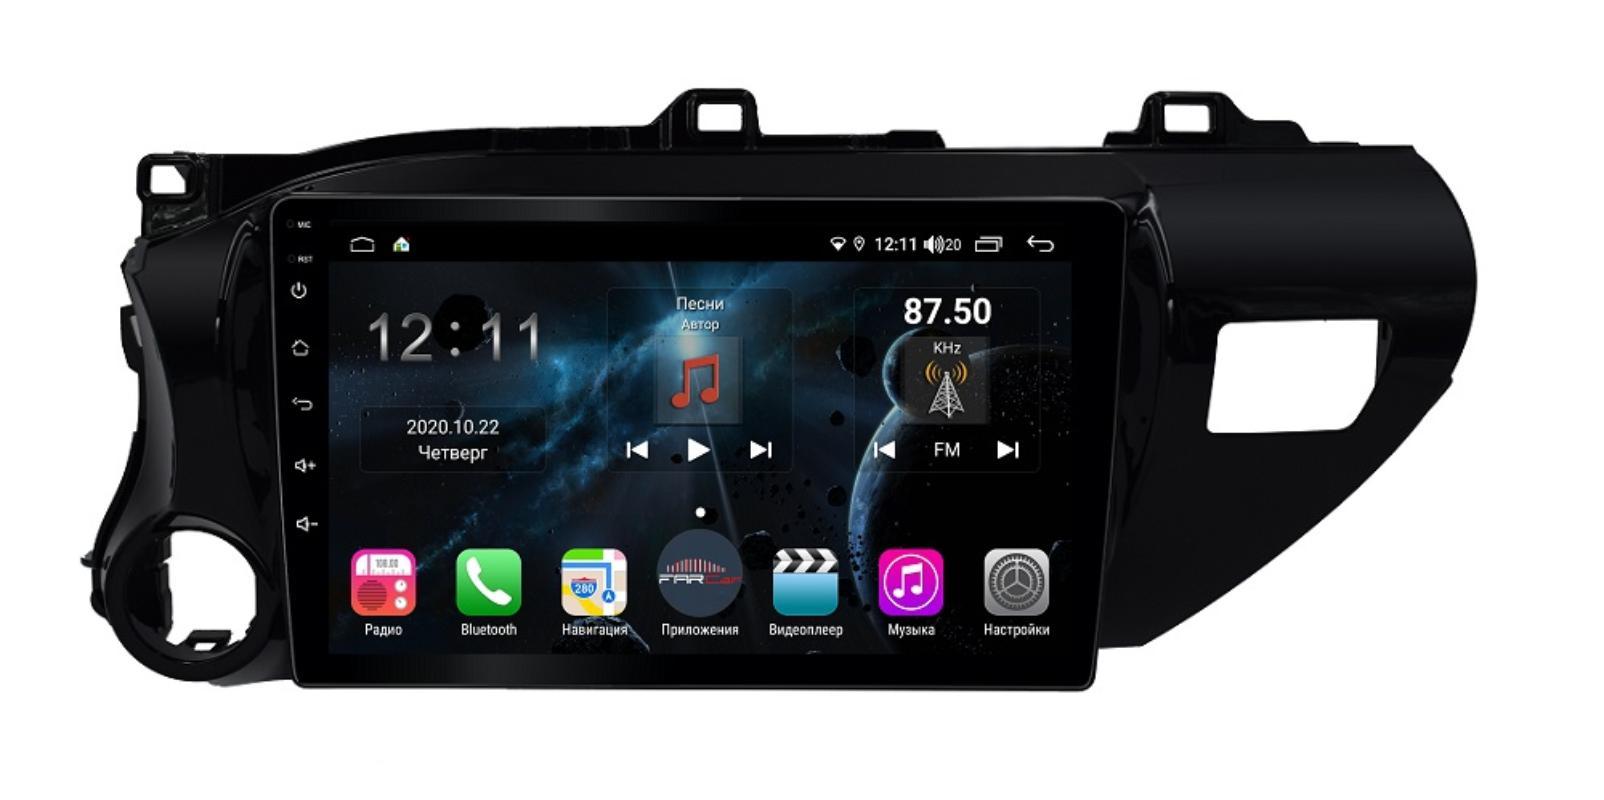 Штатная магнитола FarCar s400 Toyota Hilux на Android (H1077R) (+ Камера заднего вида в подарок!)